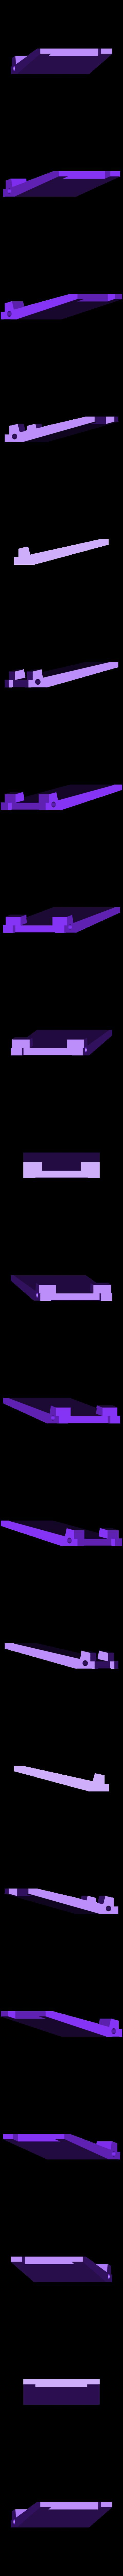 Nieuport17 - 1Bottom_Bone_1-3.STL Download STL file Nieuport 17, WW1 Warplane • 3D printing design, JimmyHo